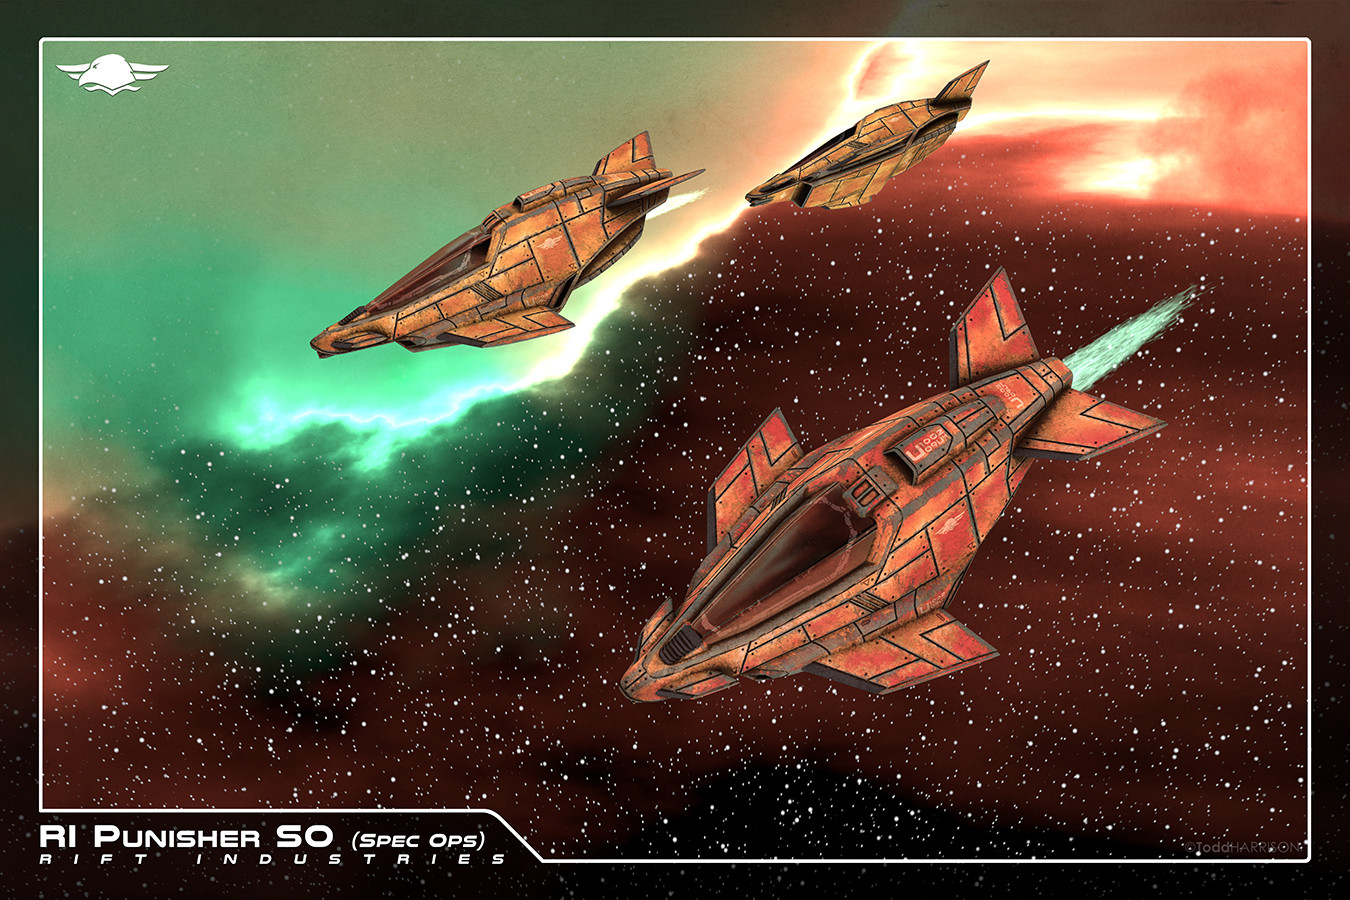 Todd harrison ri punisher so trio nebula poster1 web